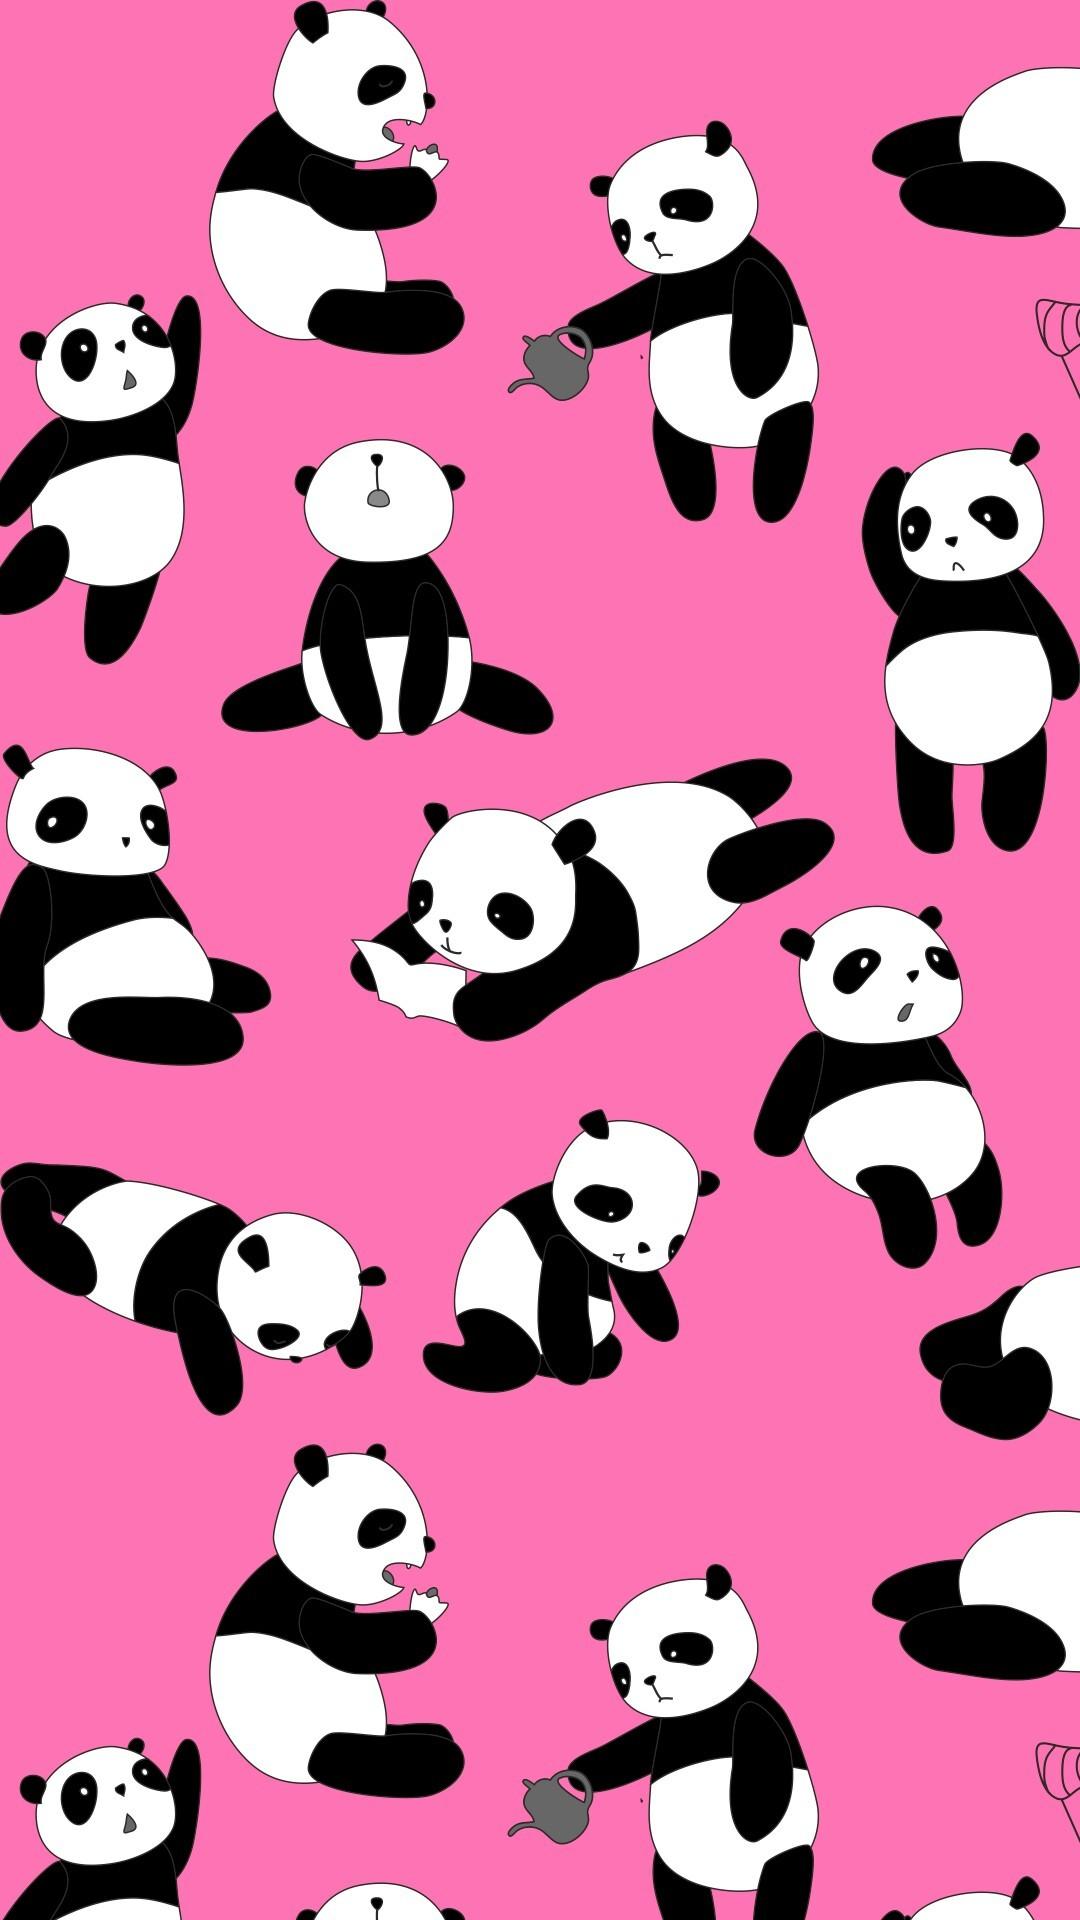 Cute Girly Wallpapers For Iphone 6 Plus Panda Iphone Wallpaper 82 Images